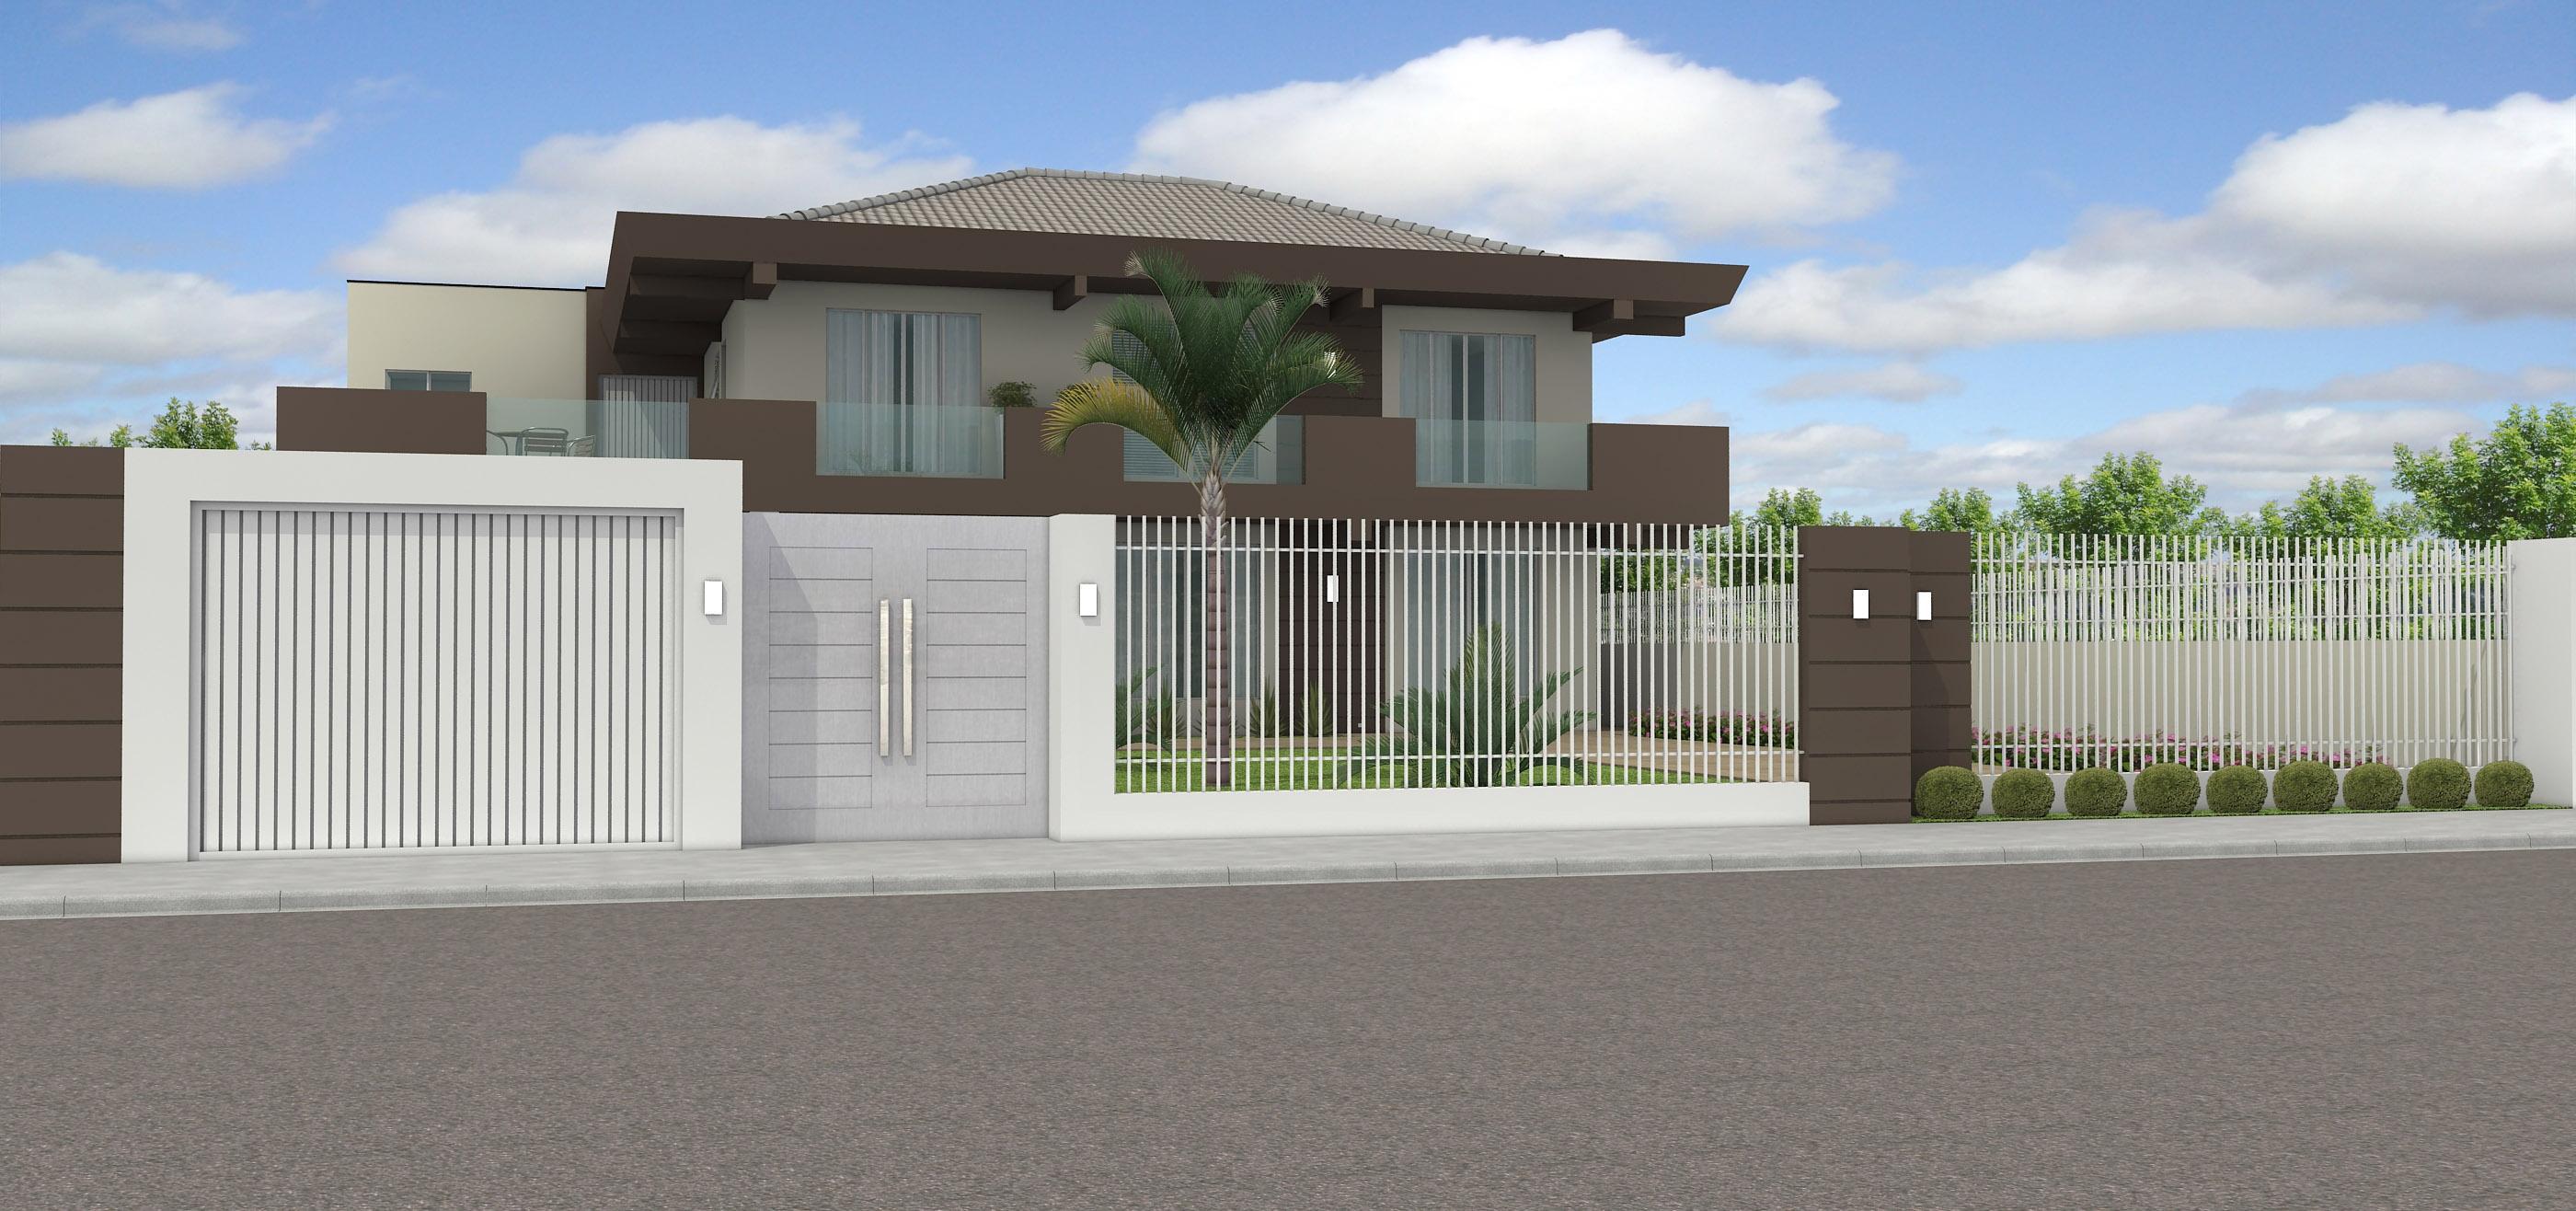 60 modelos de muros residenciais fachadas fotos e dicas for Modelos de casas grandes